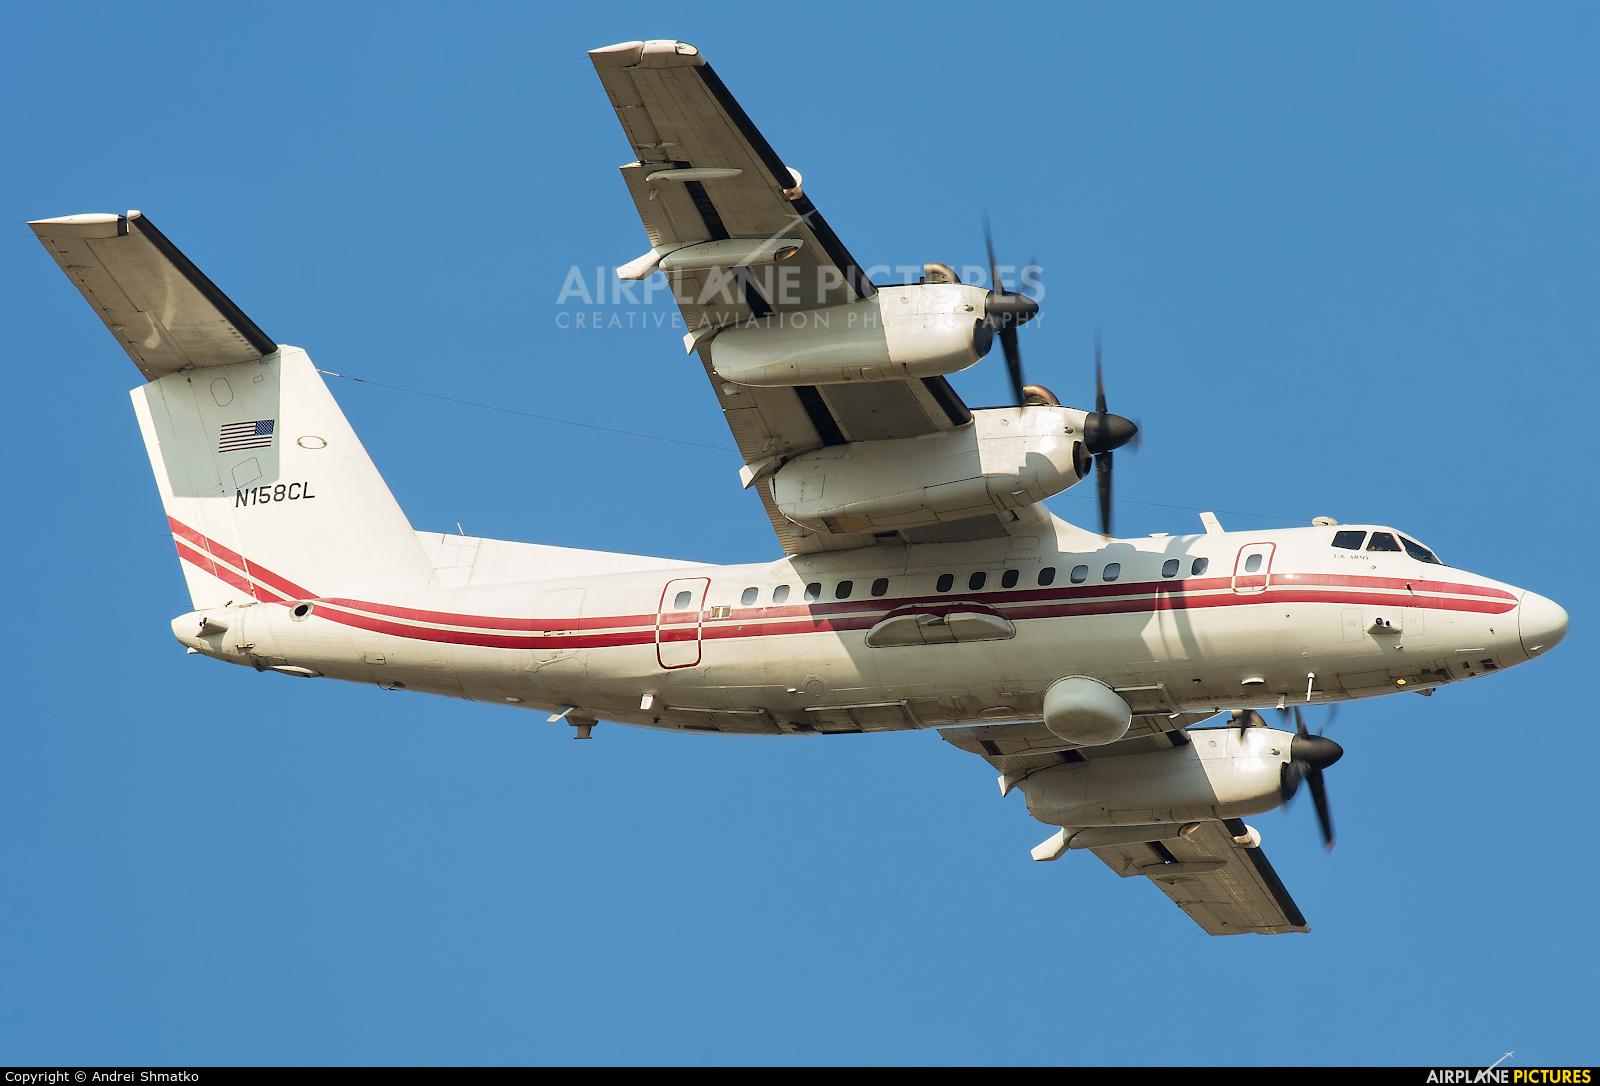 USA - Army N158CL aircraft at Off Airport - South Korea